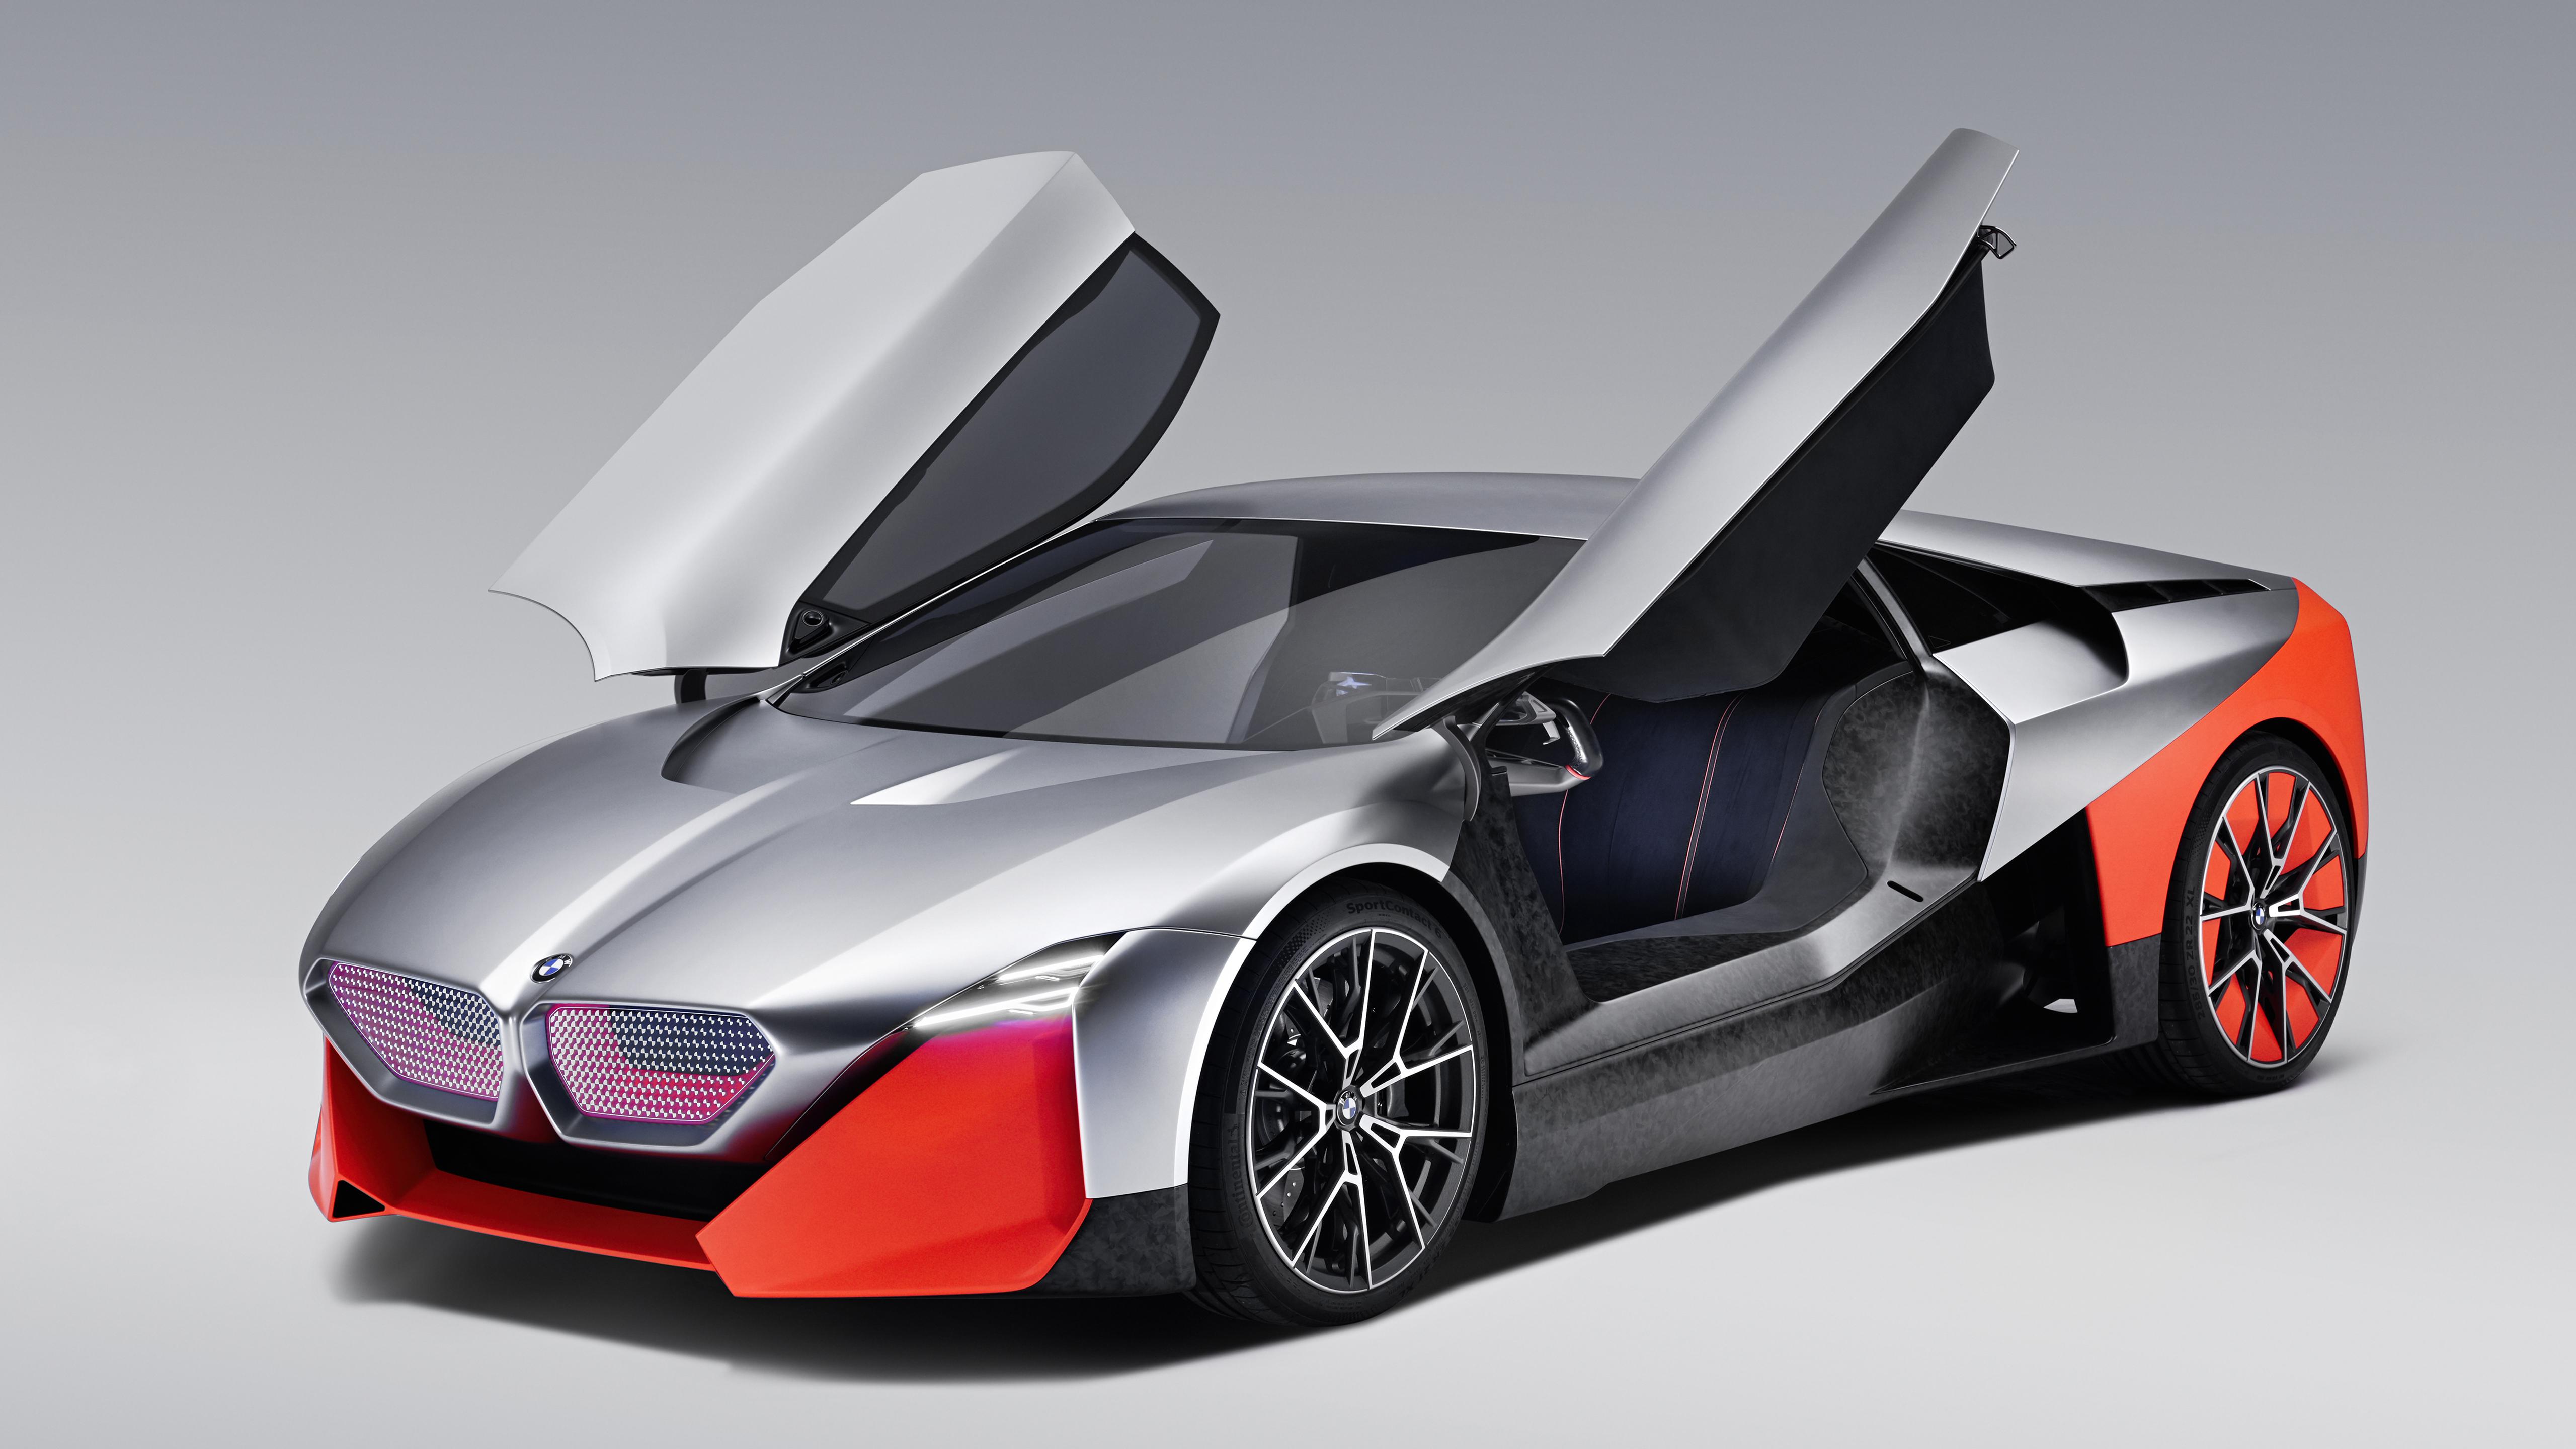 Bmw Vision M Next 2019 4k 5 Wallpaper Hd Car Wallpapers Id 12807